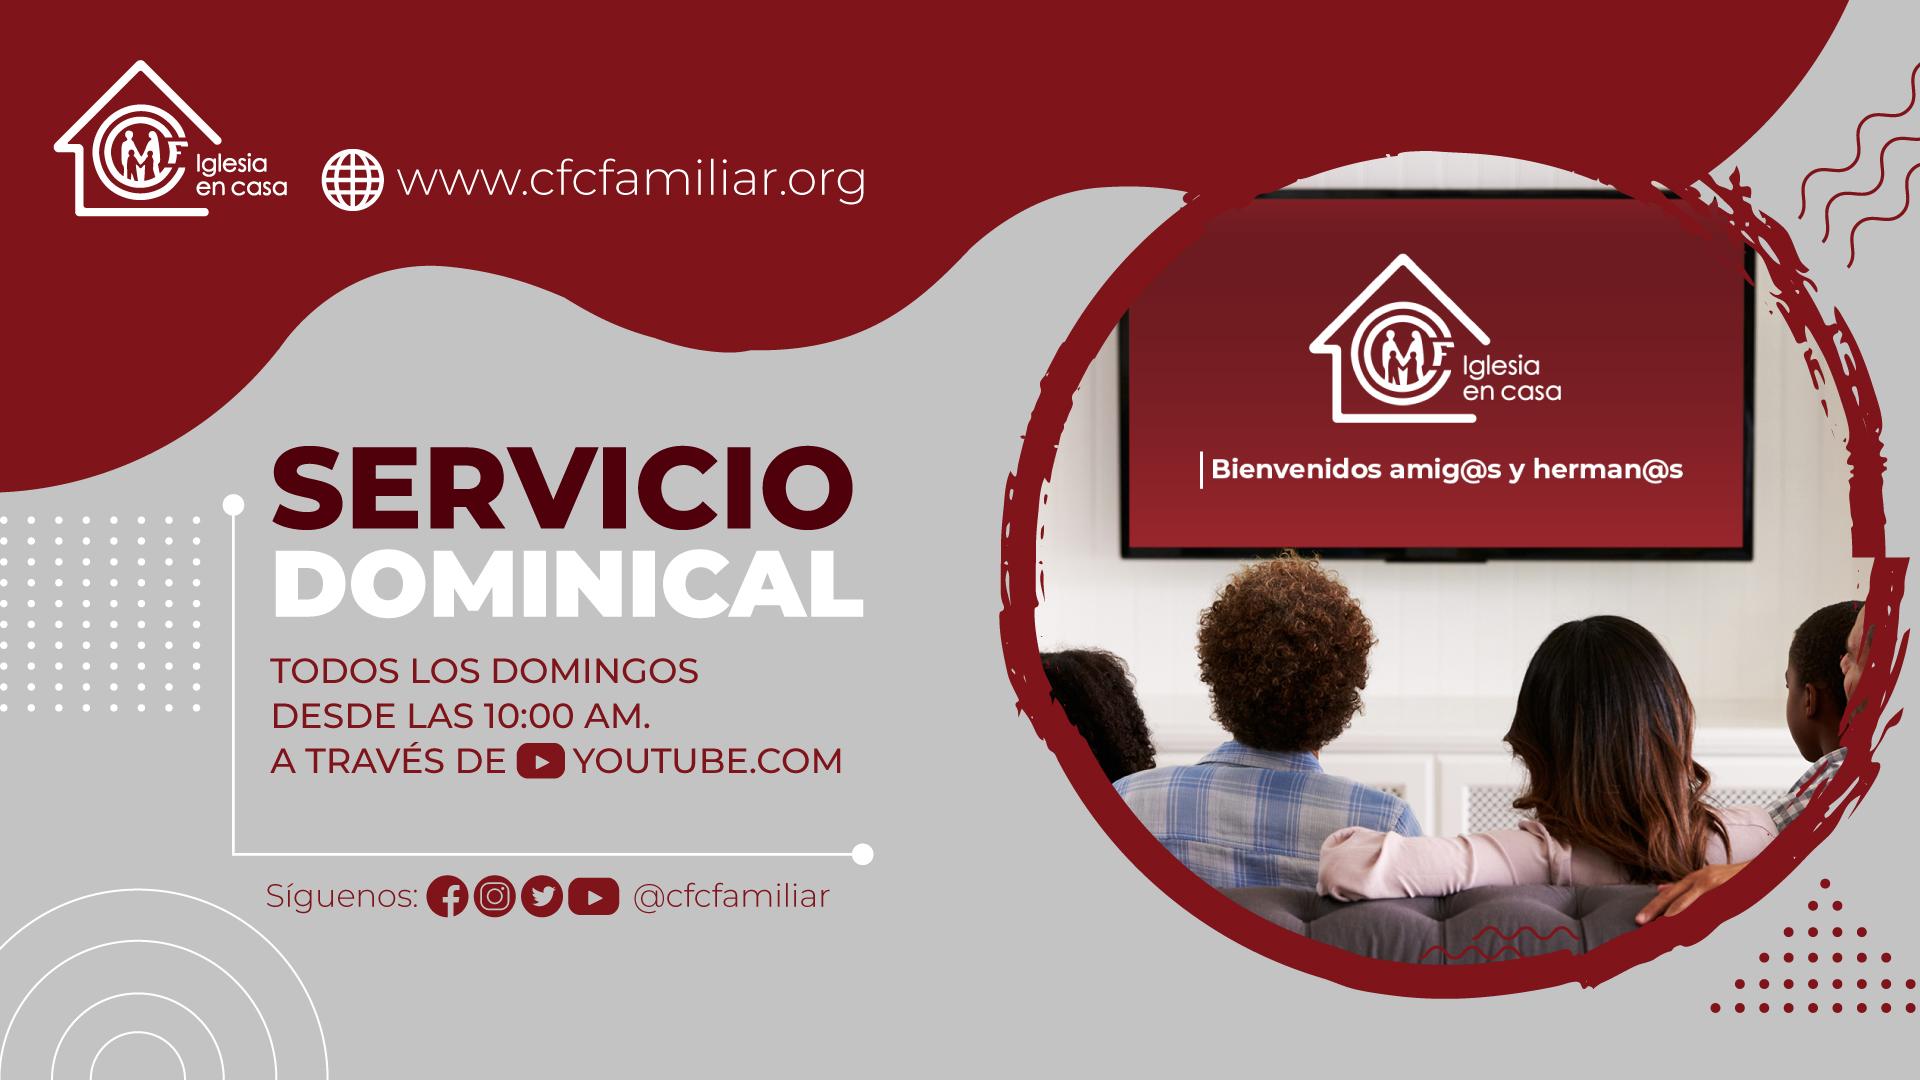 SERVICIO DOMINICAL 2021